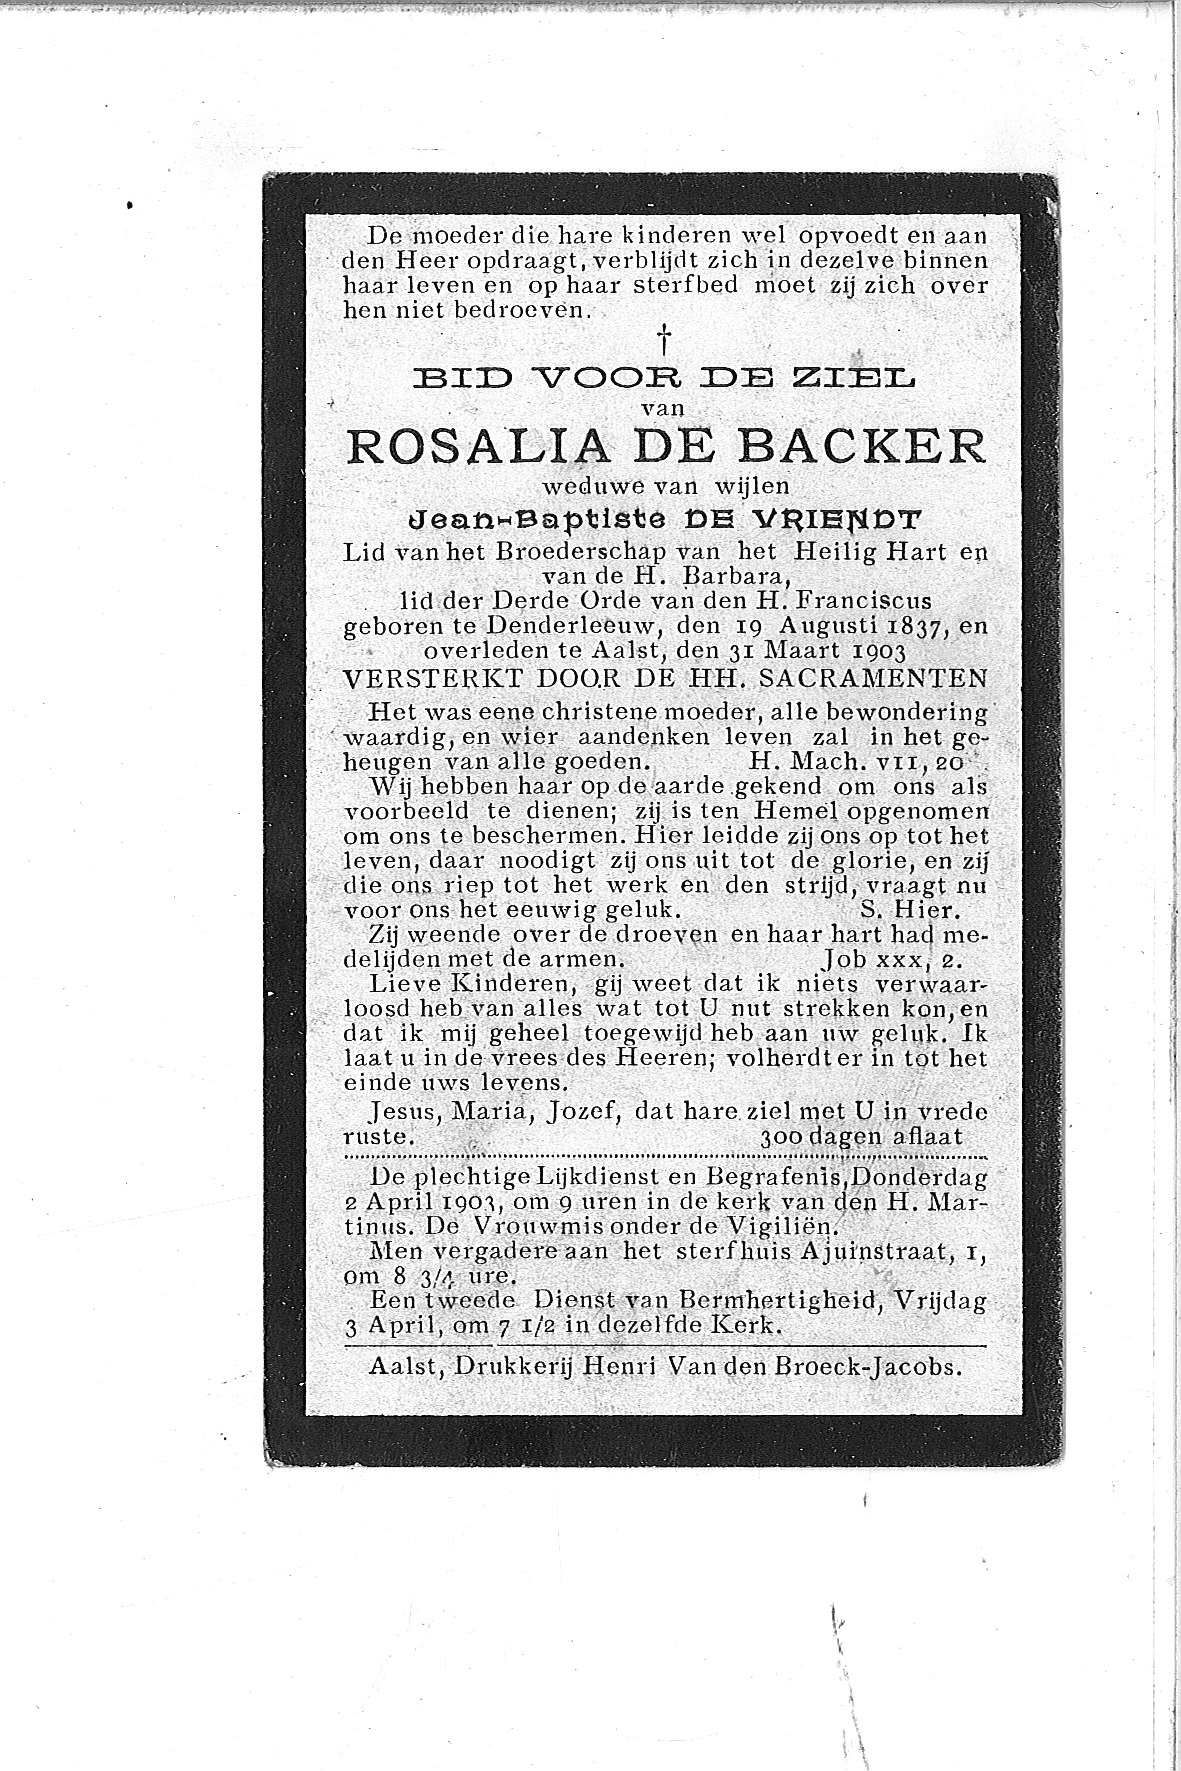 Rosalia(1903)20140304145708_00111.jpg